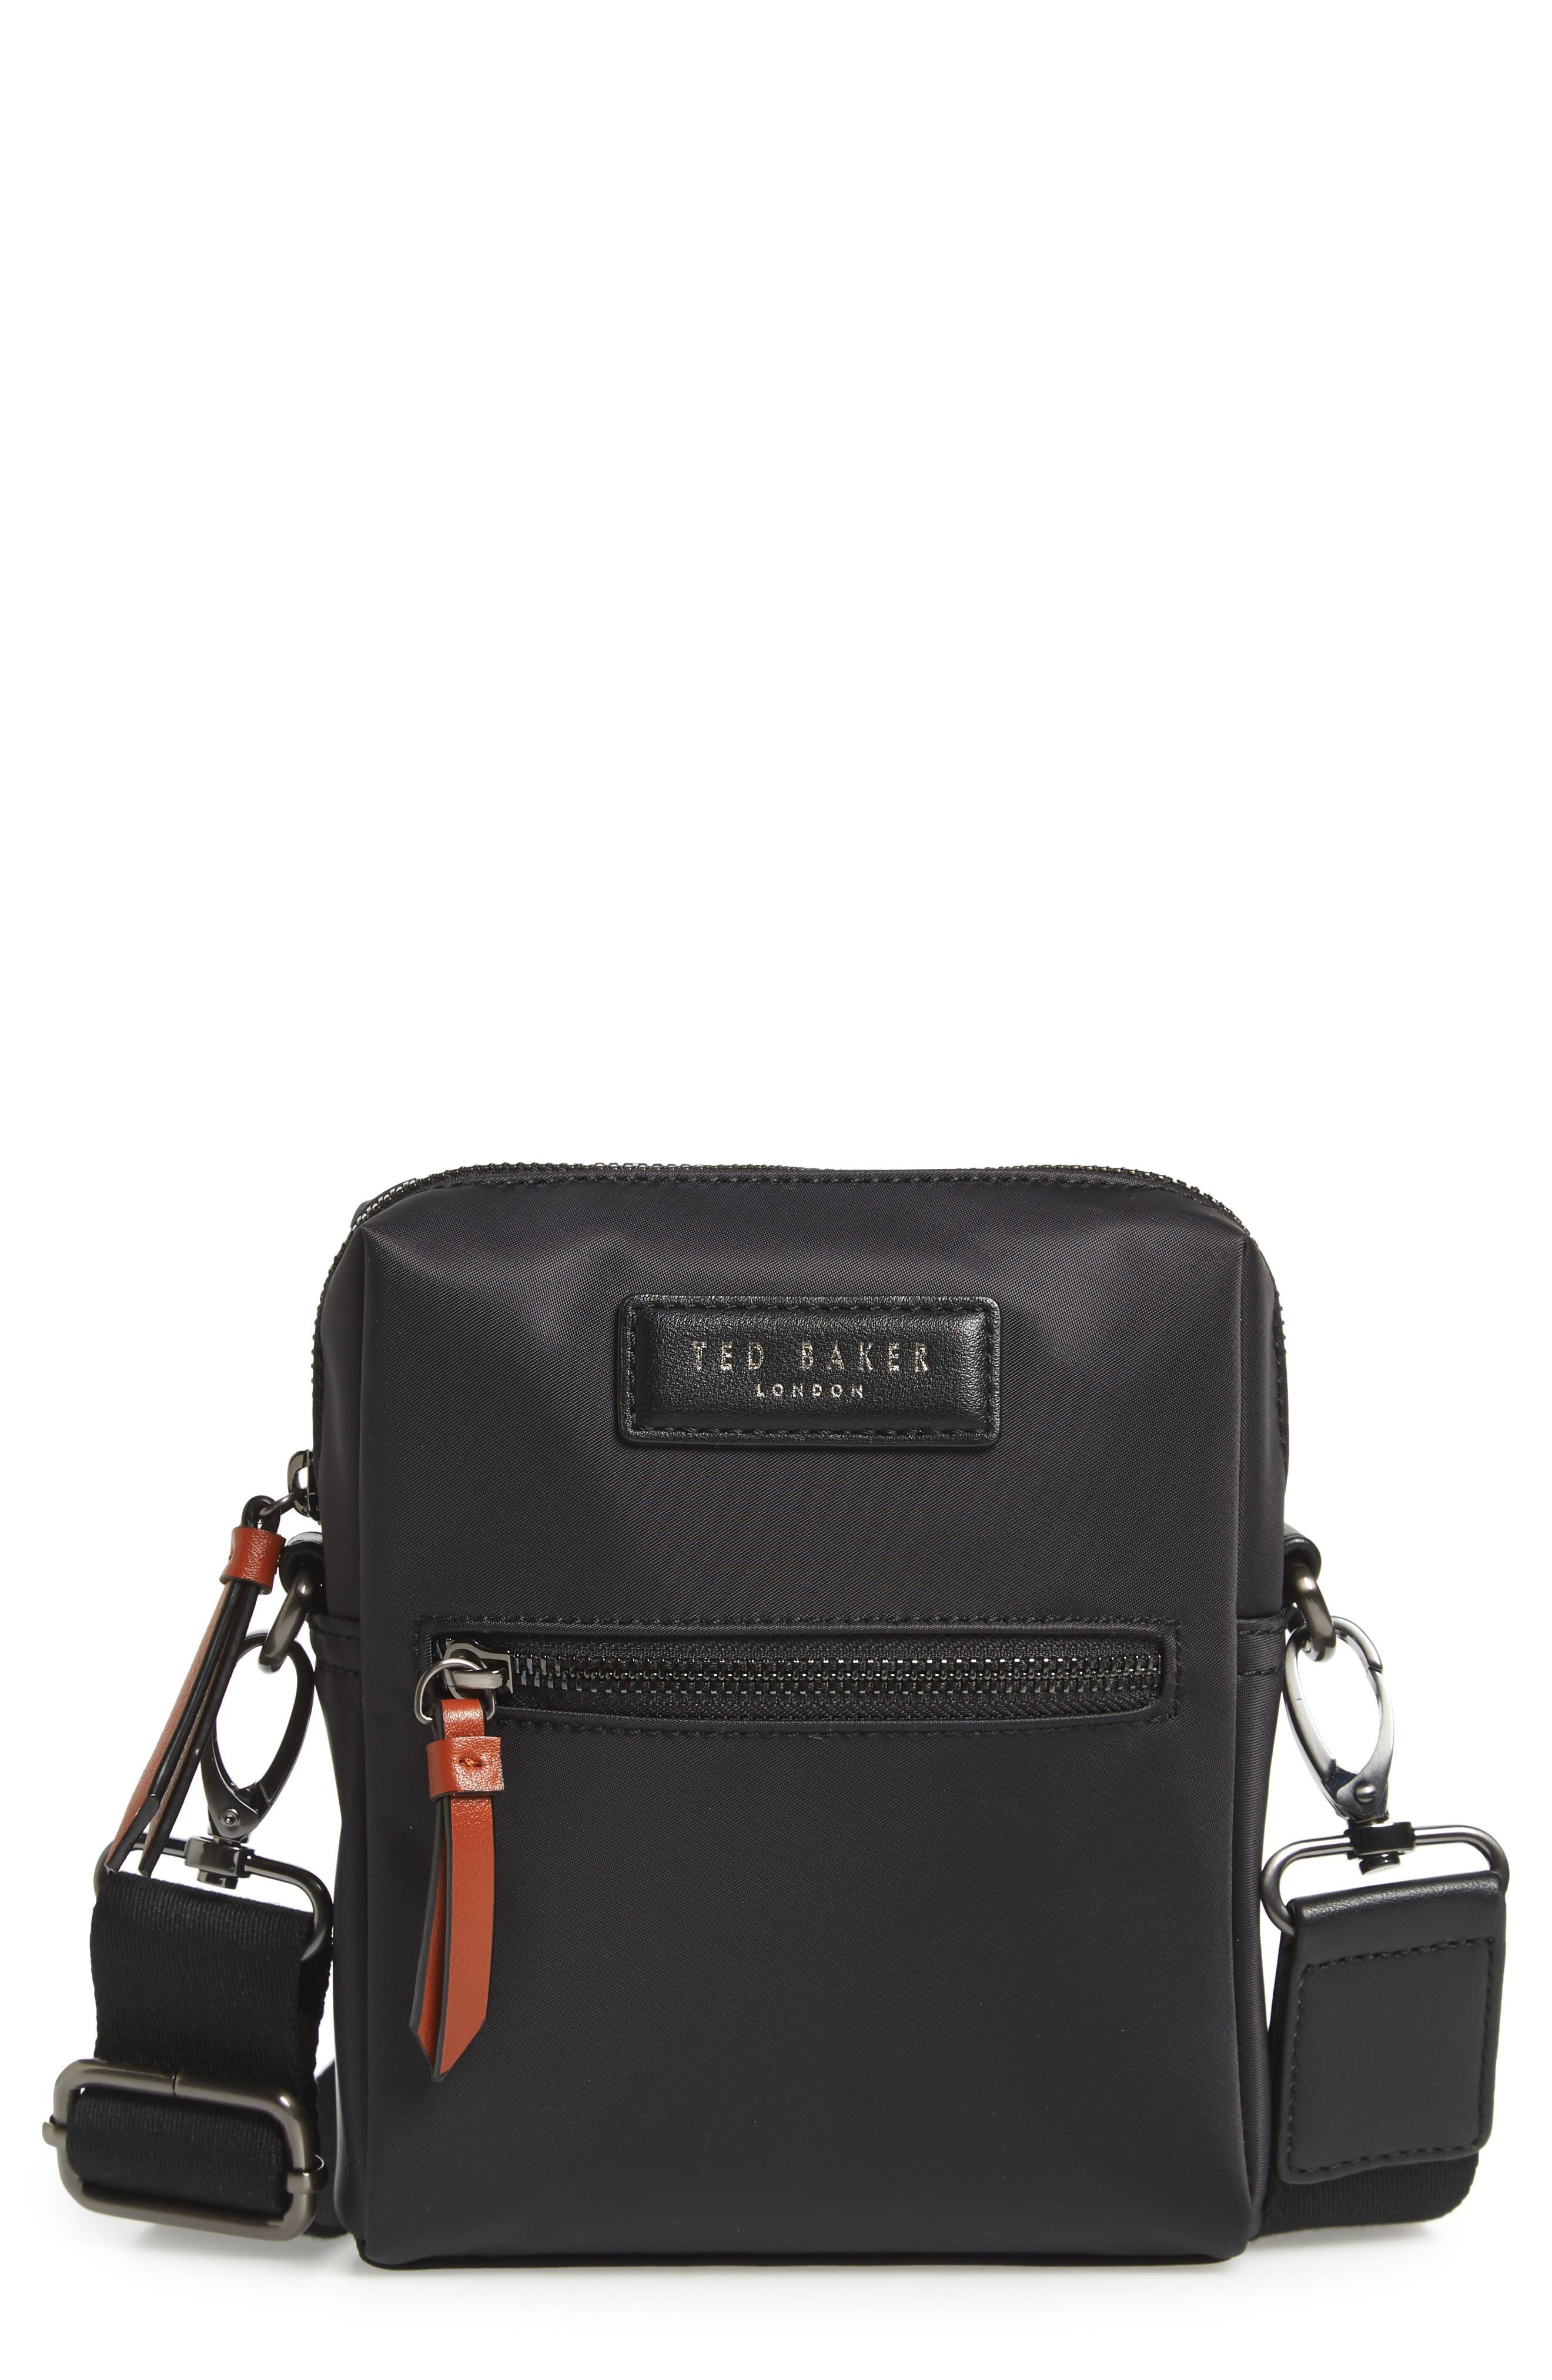 TED BAKER LONDON Mini Flight Bag, Main, color, BLACK